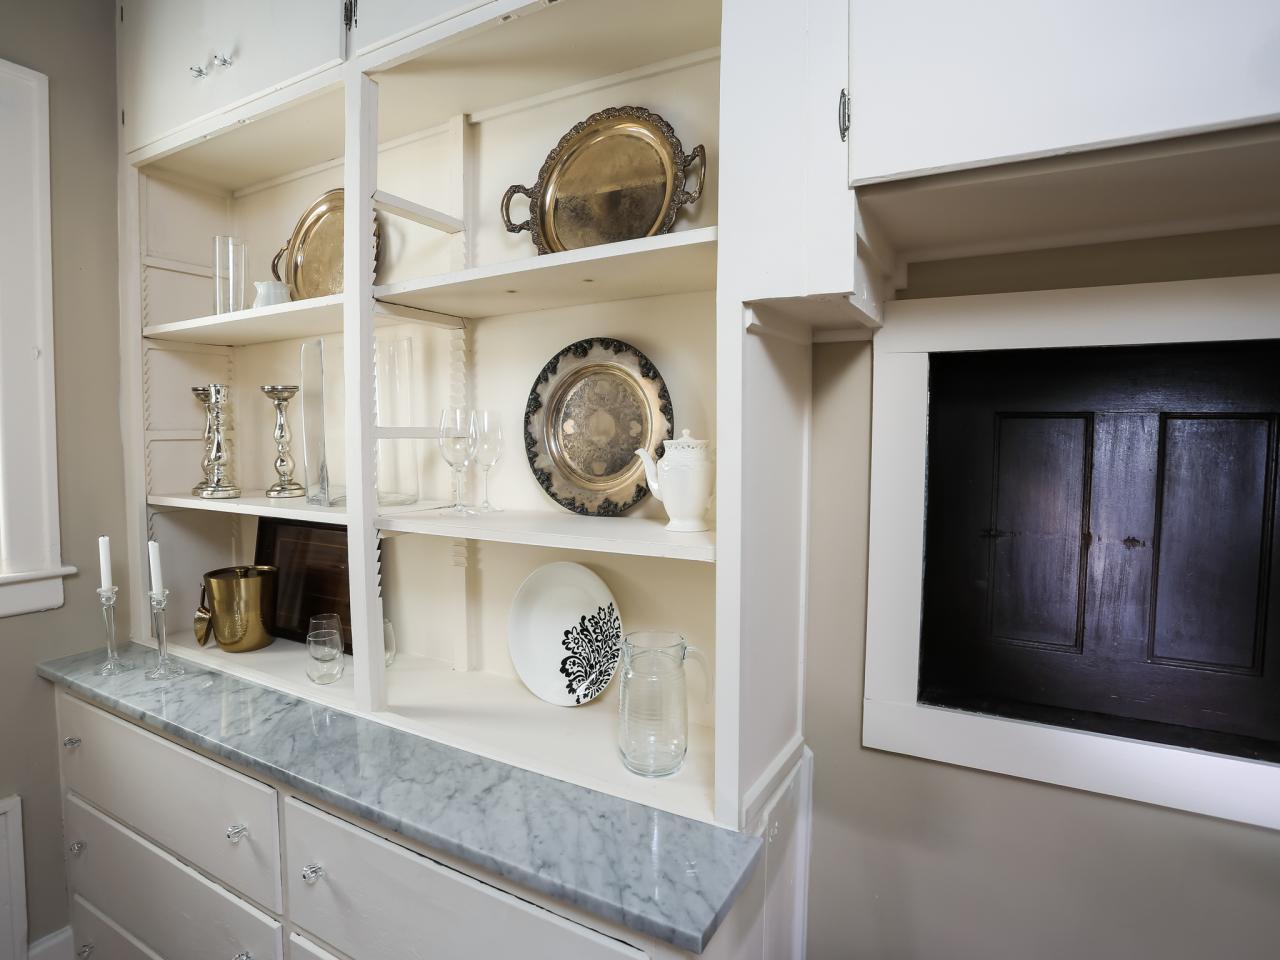 Uncategorized Nicole Curtis Kitchen Design nicole curtis hgtv